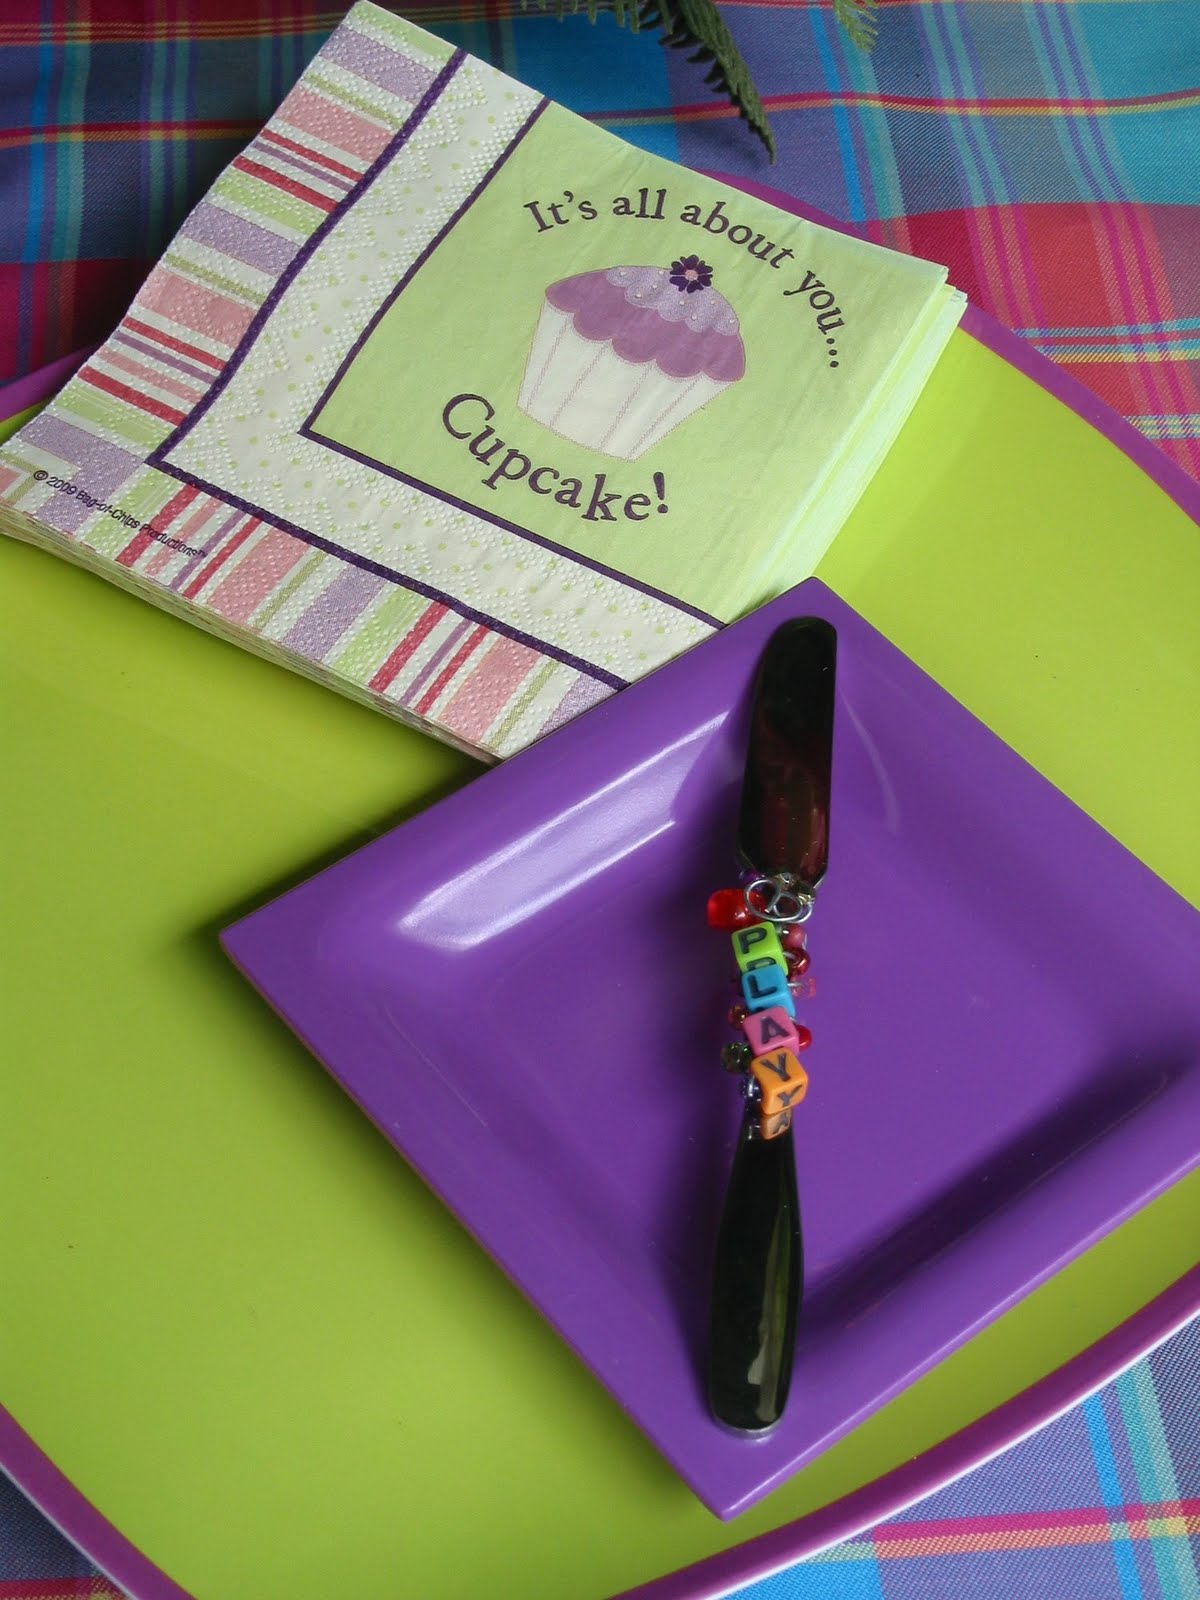 http://3.bp.blogspot.com/_l-1XJZWoSQU/TFDf_0FBOwI/AAAAAAAAHts/Qx4wn4z5nrA/s1600/Cupcake+plate,+napkin+%26+spreader+set.JPG